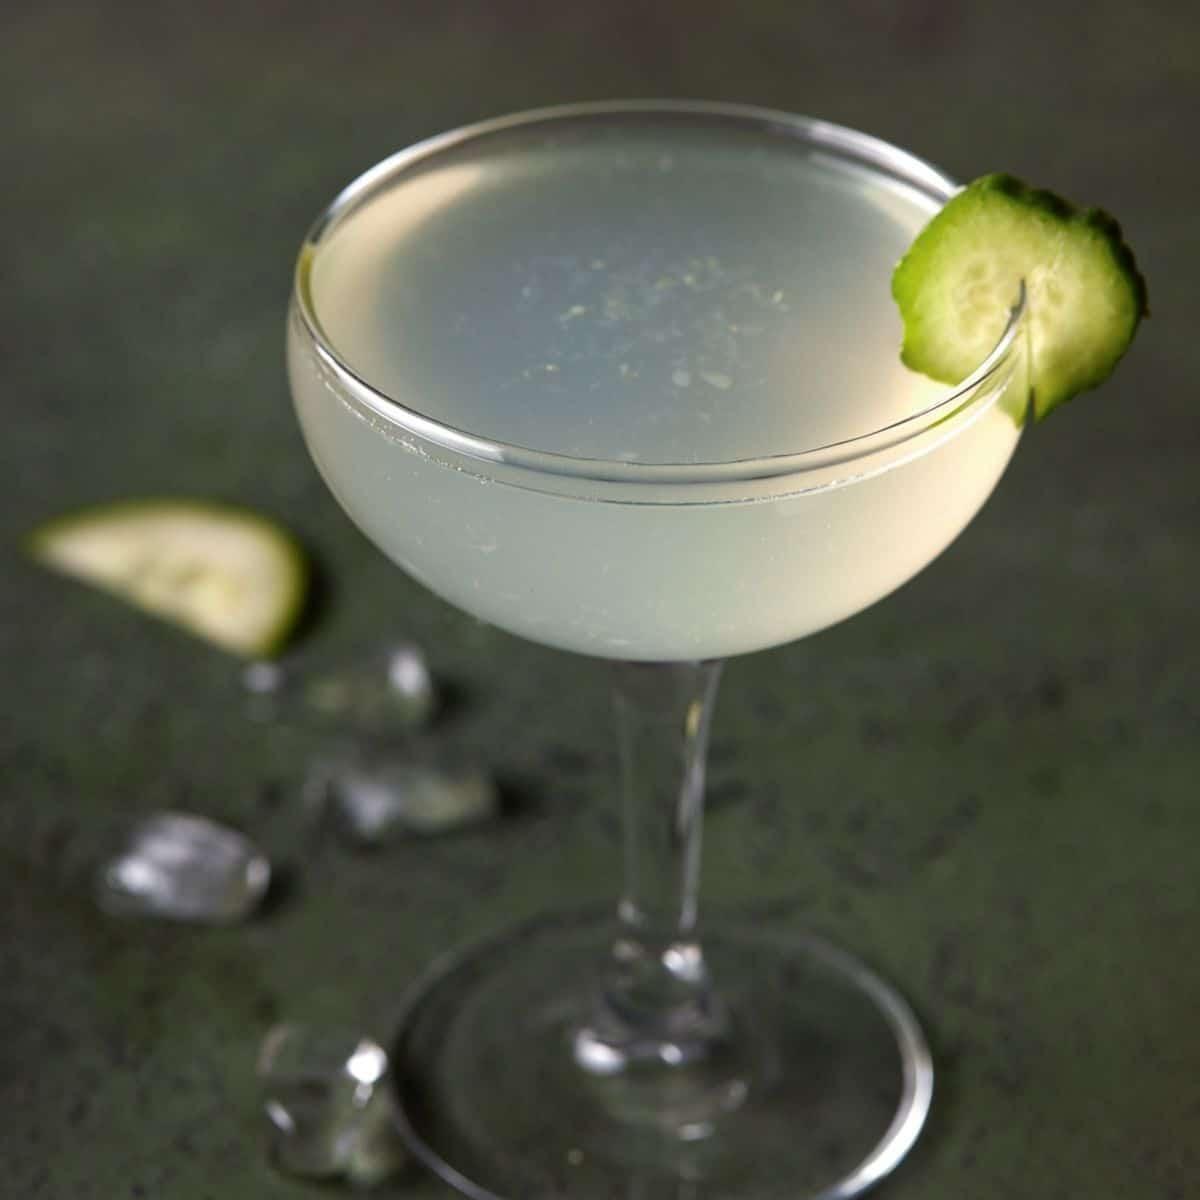 Cucumber vodka gimlet in a glass with a cucumber garnish.